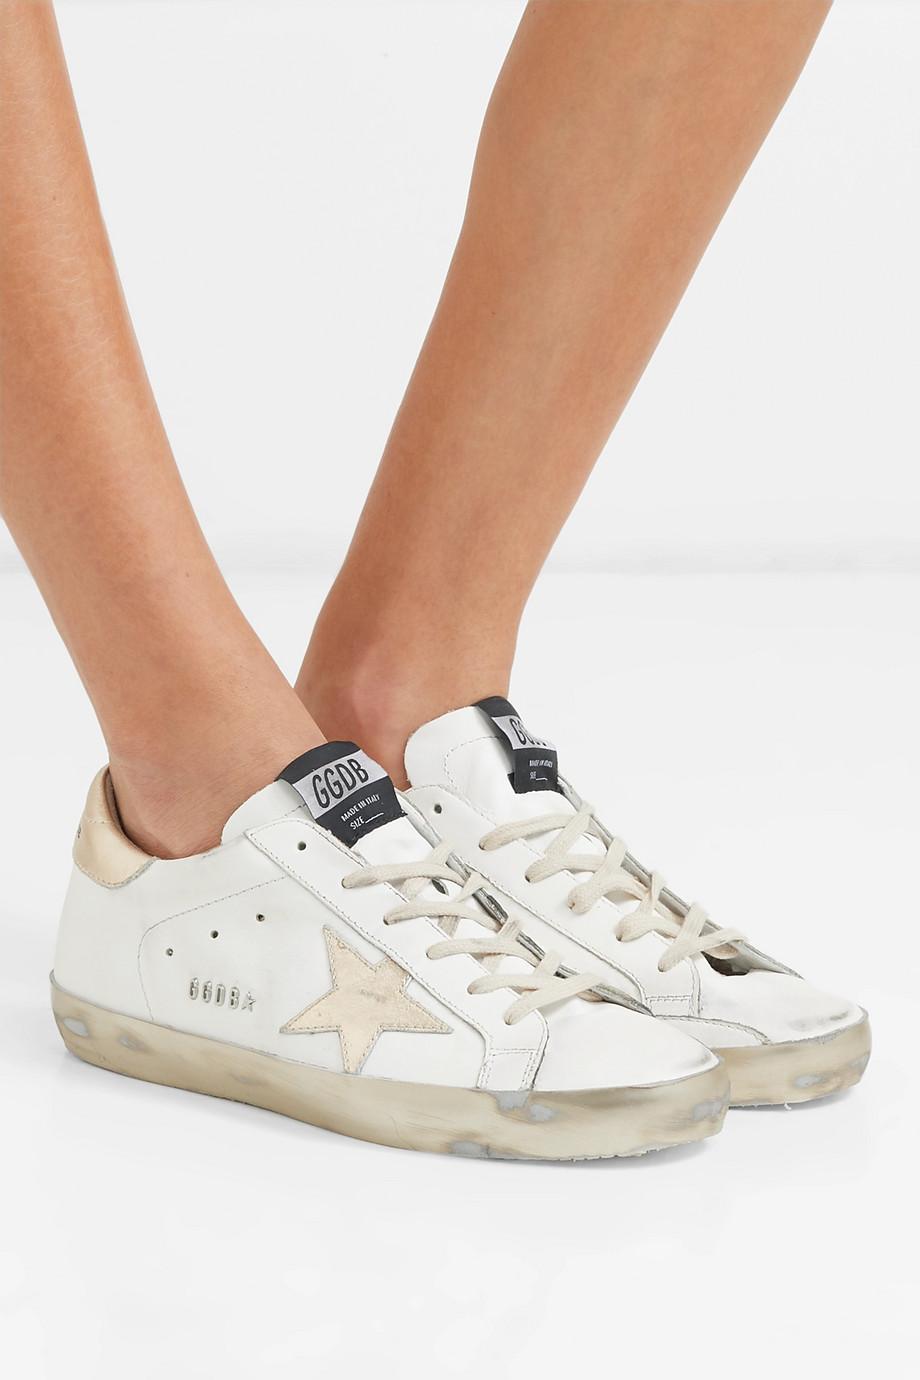 Golden Goose Superstar Sneakers aus Leder in Distressed-Optik